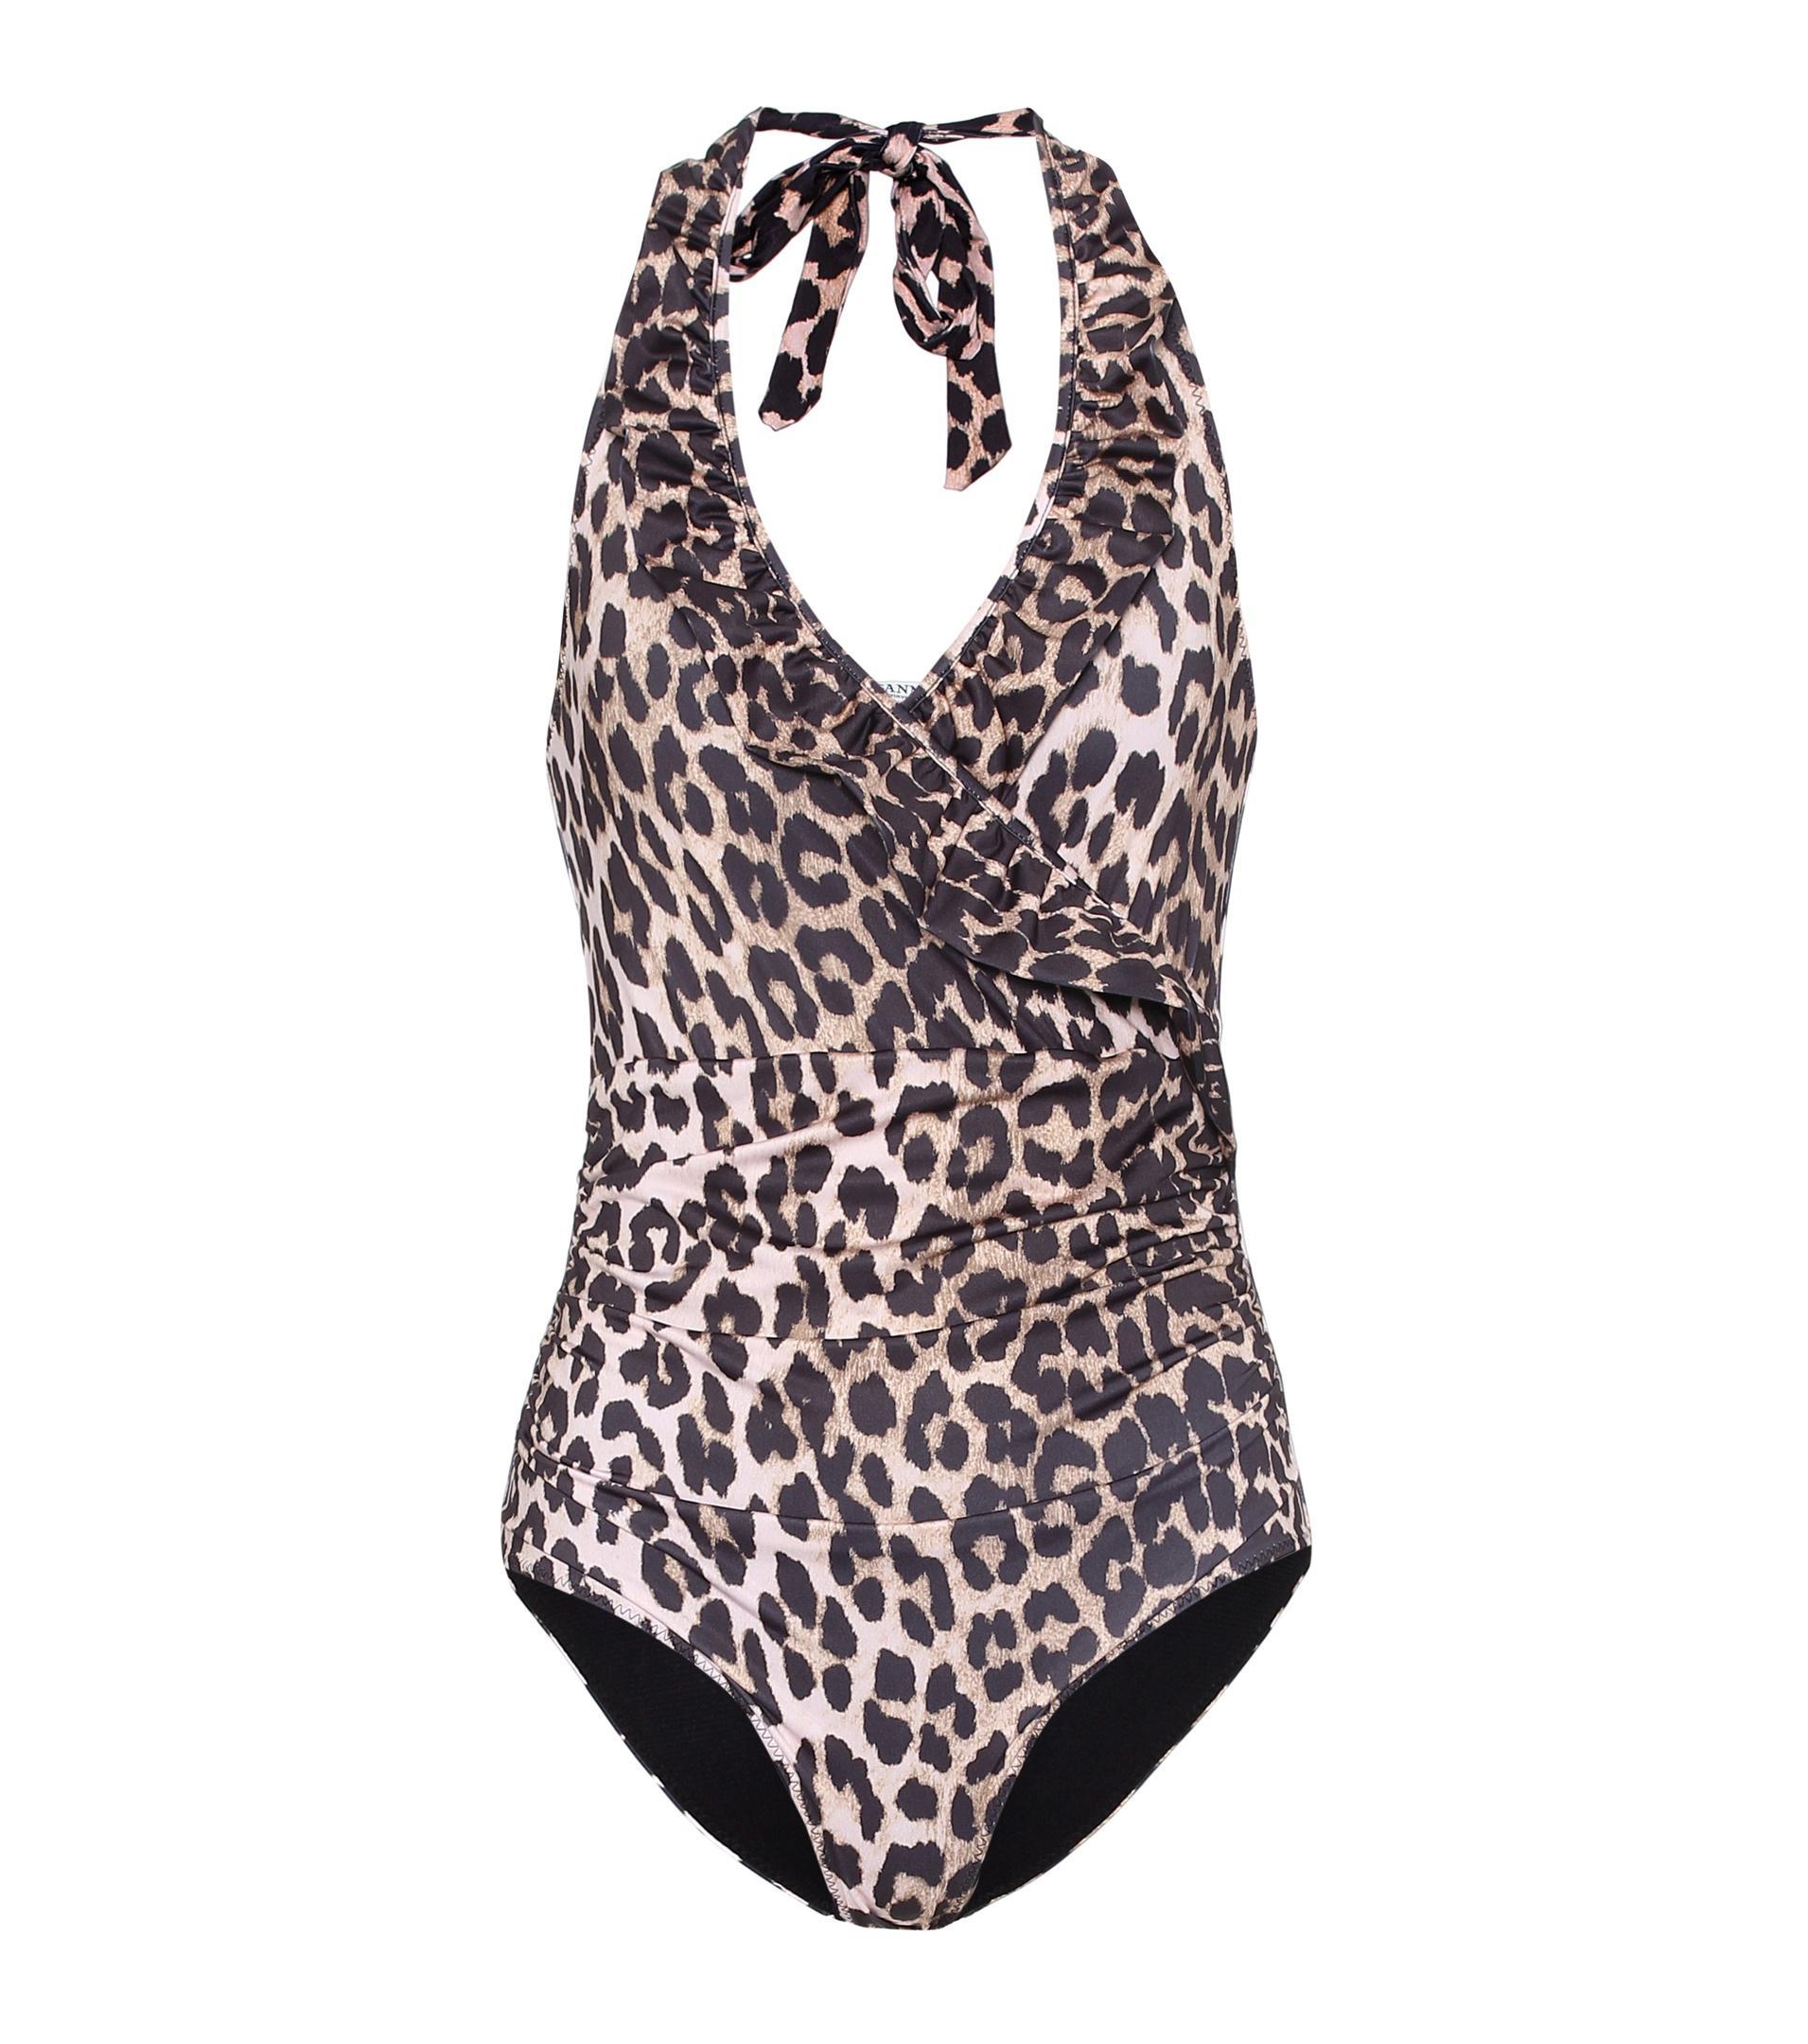 d033b53a76 Ganni Belrose One-piece Swimsuit in Black - Lyst